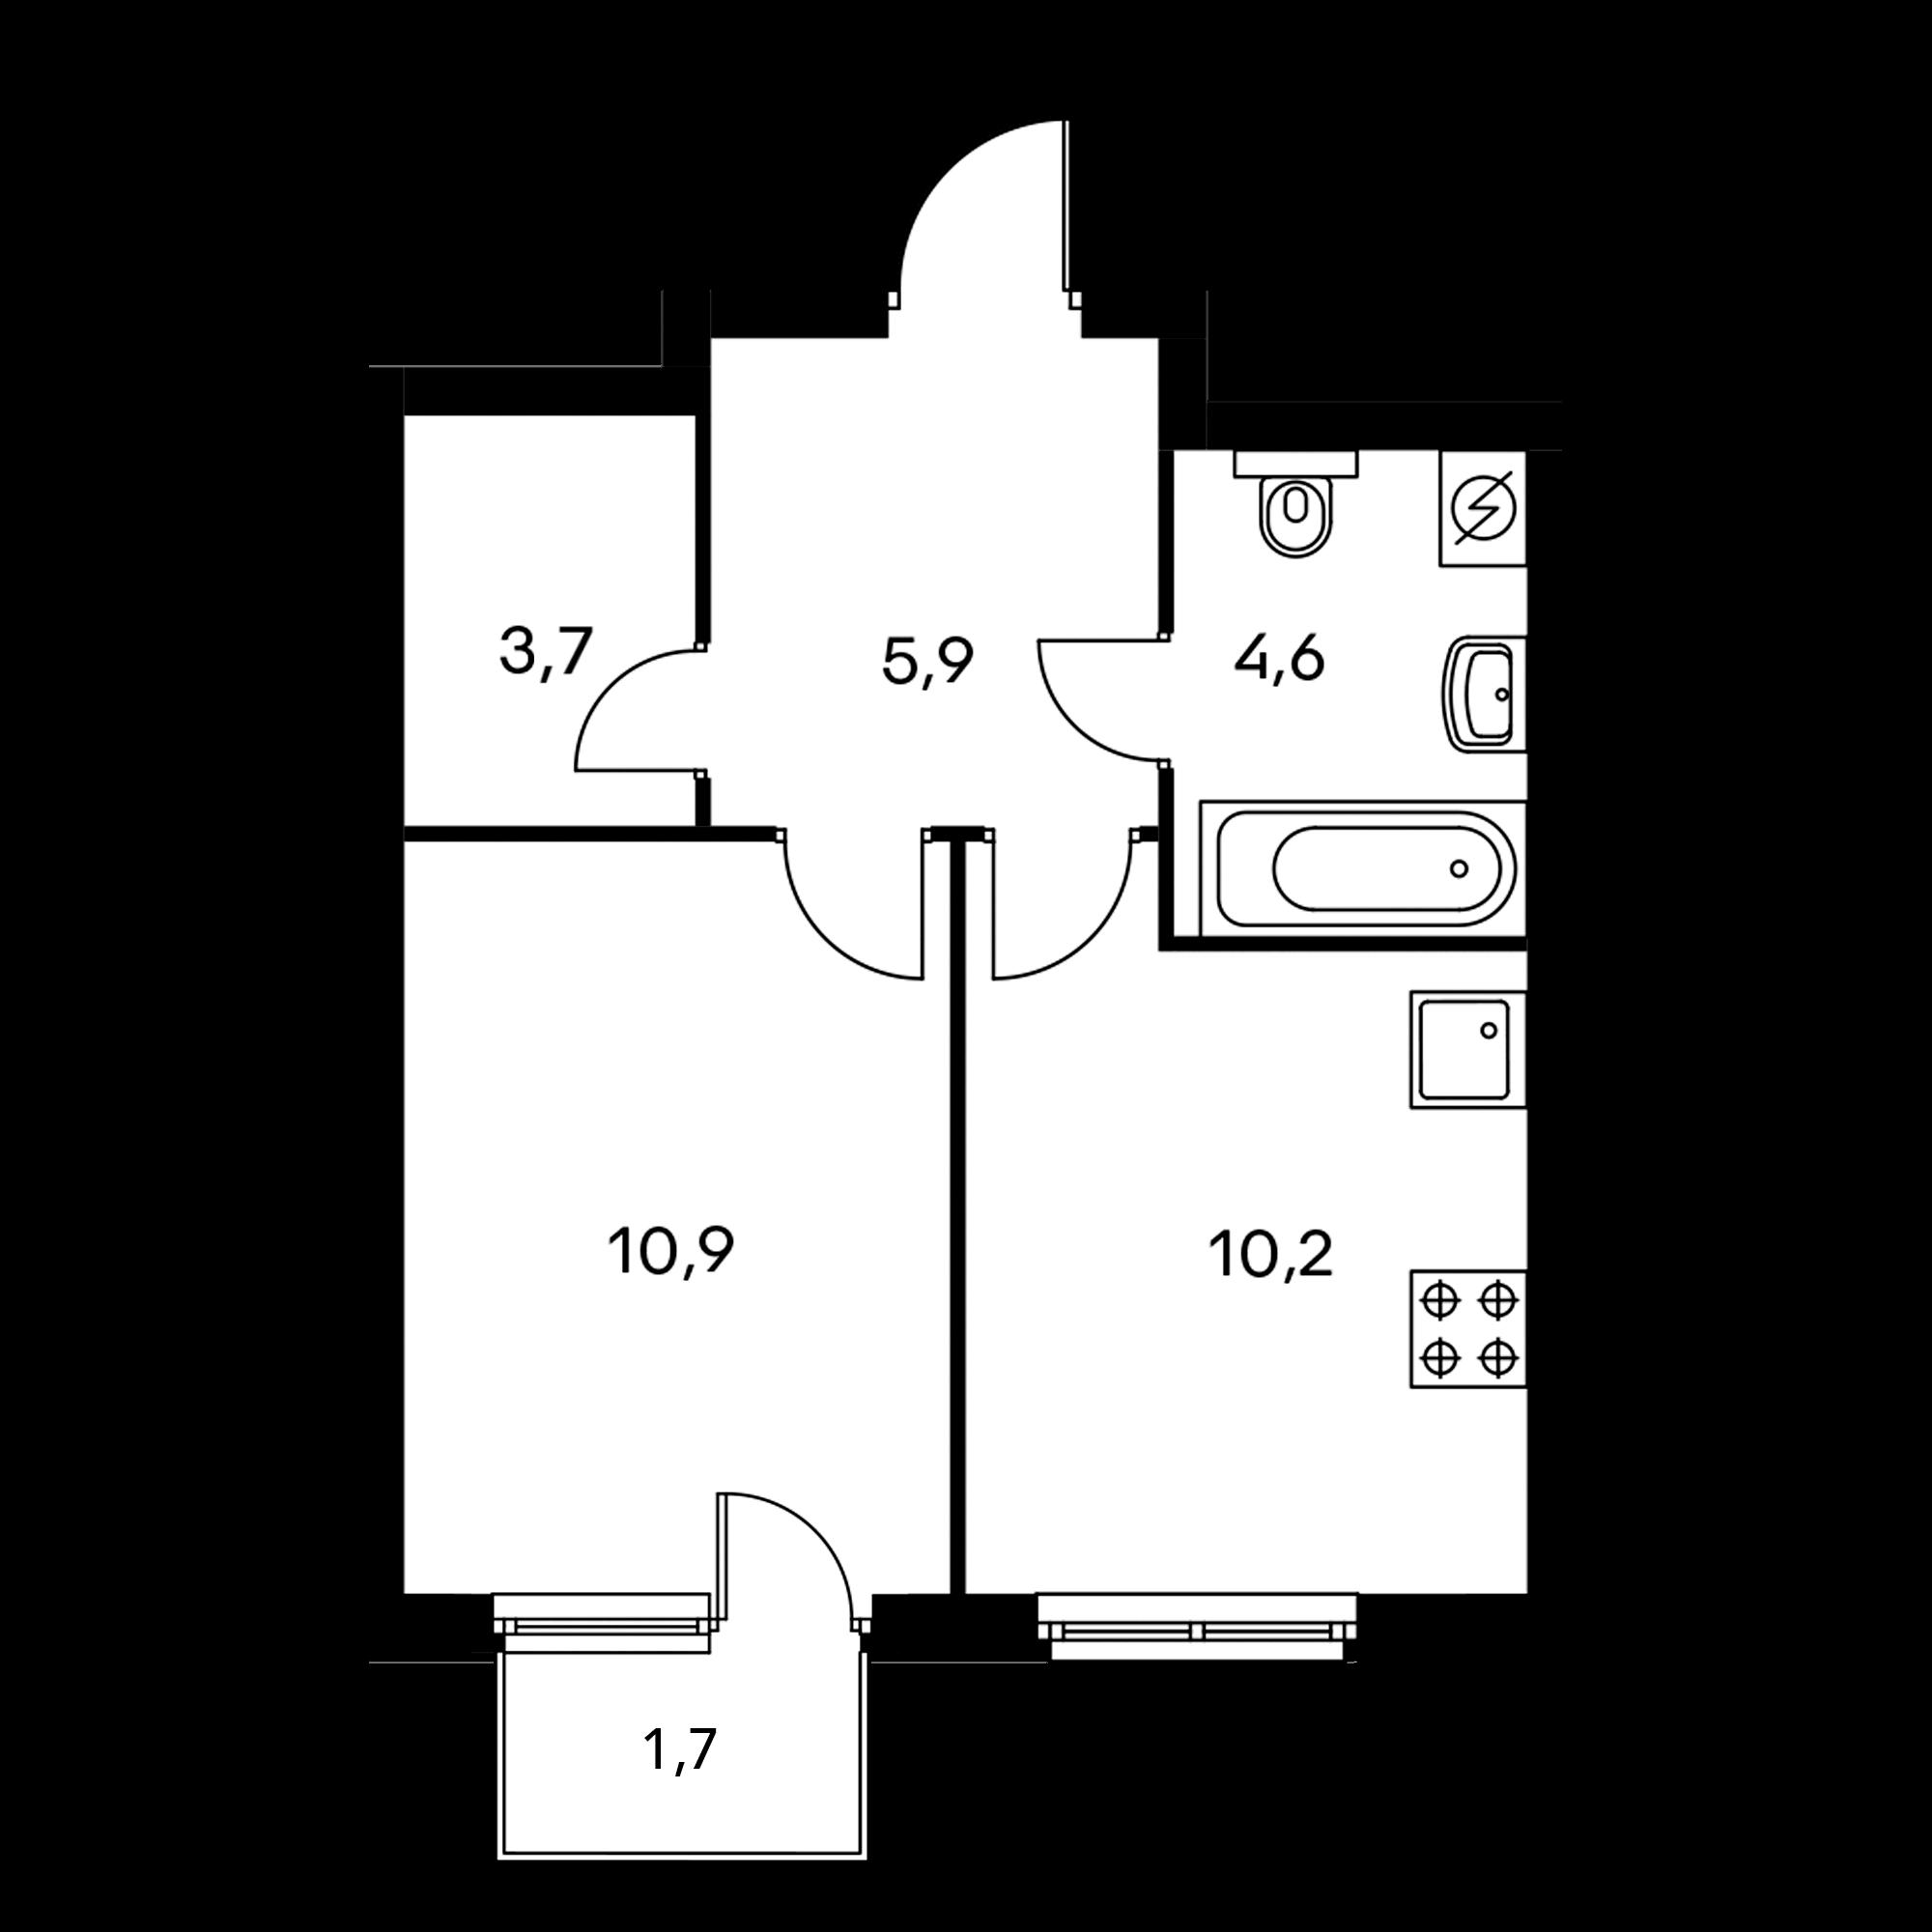 1KM1_6.0-1B1